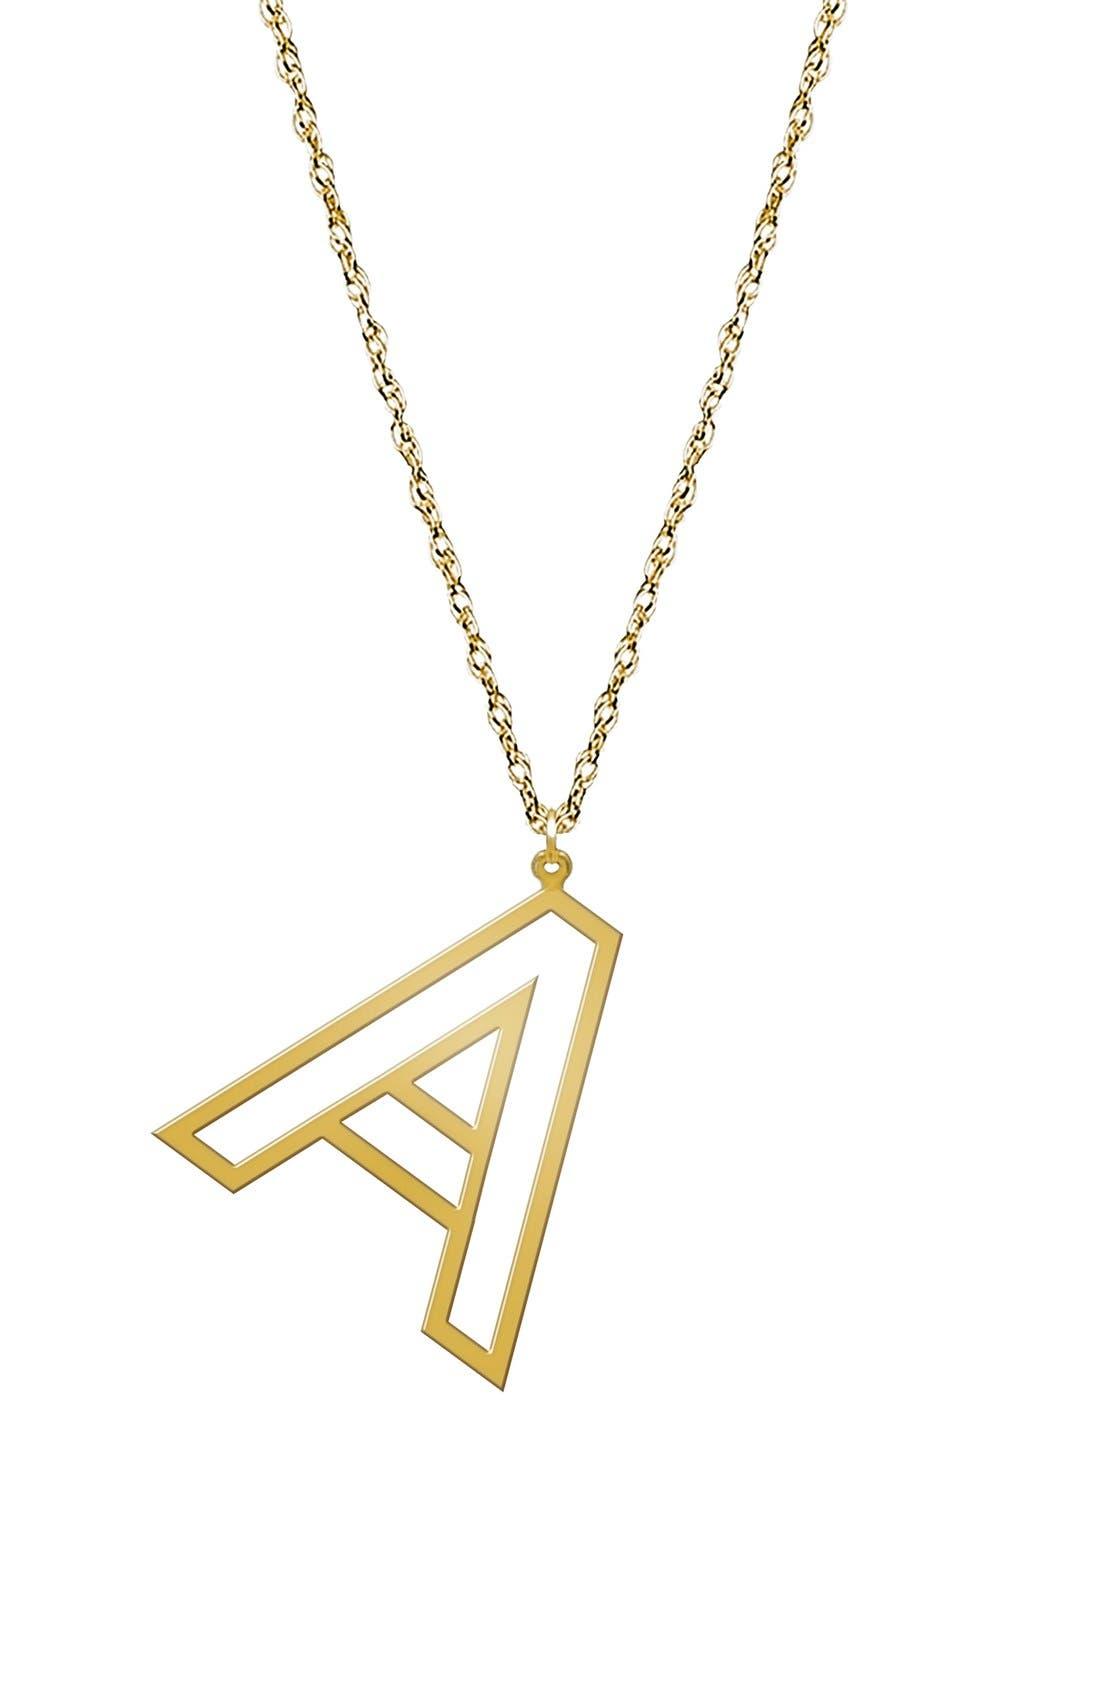 Alternate Image 1 Selected - Jane Basch Designs Varsity Initial Pendant Necklace